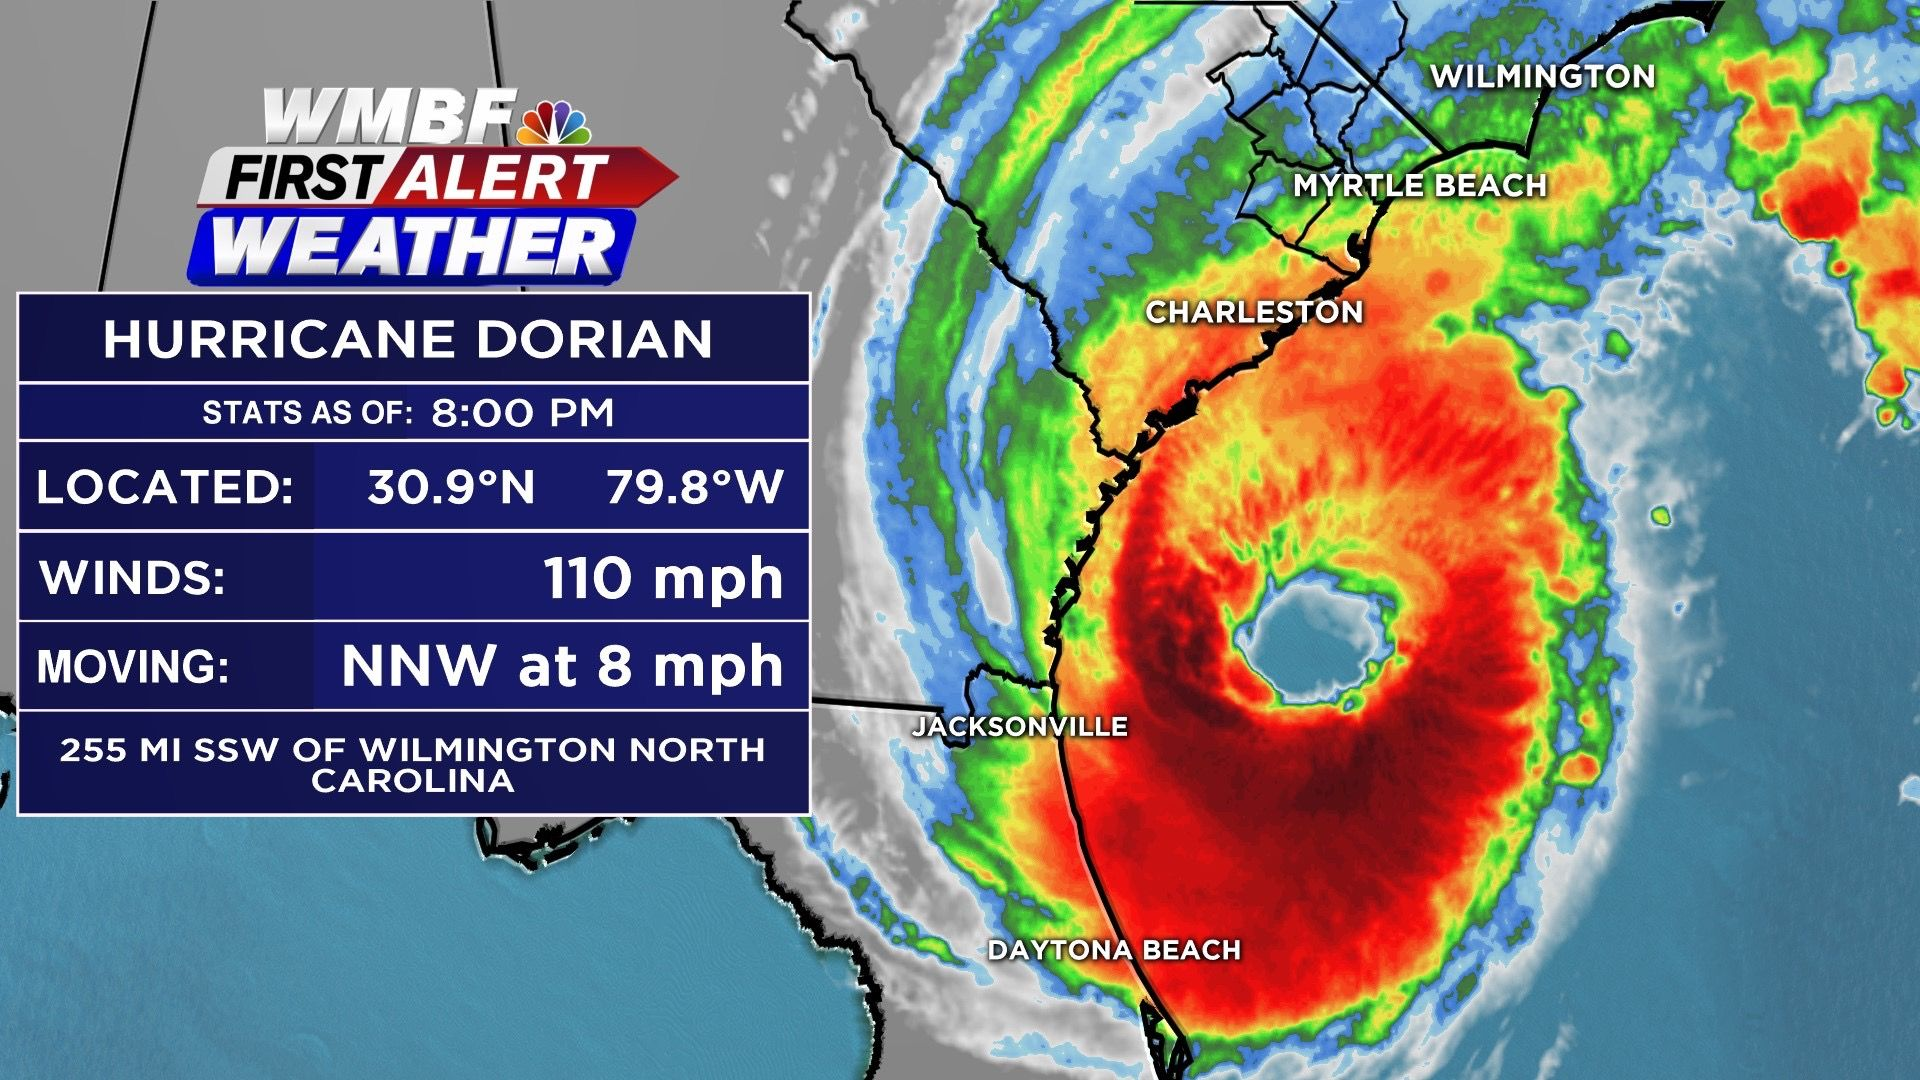 Pin By Judy Klopp On Hurricane Dorian 2019 In 2019 Disaster Preparedness Wilmington North Carolina Daytona Beach